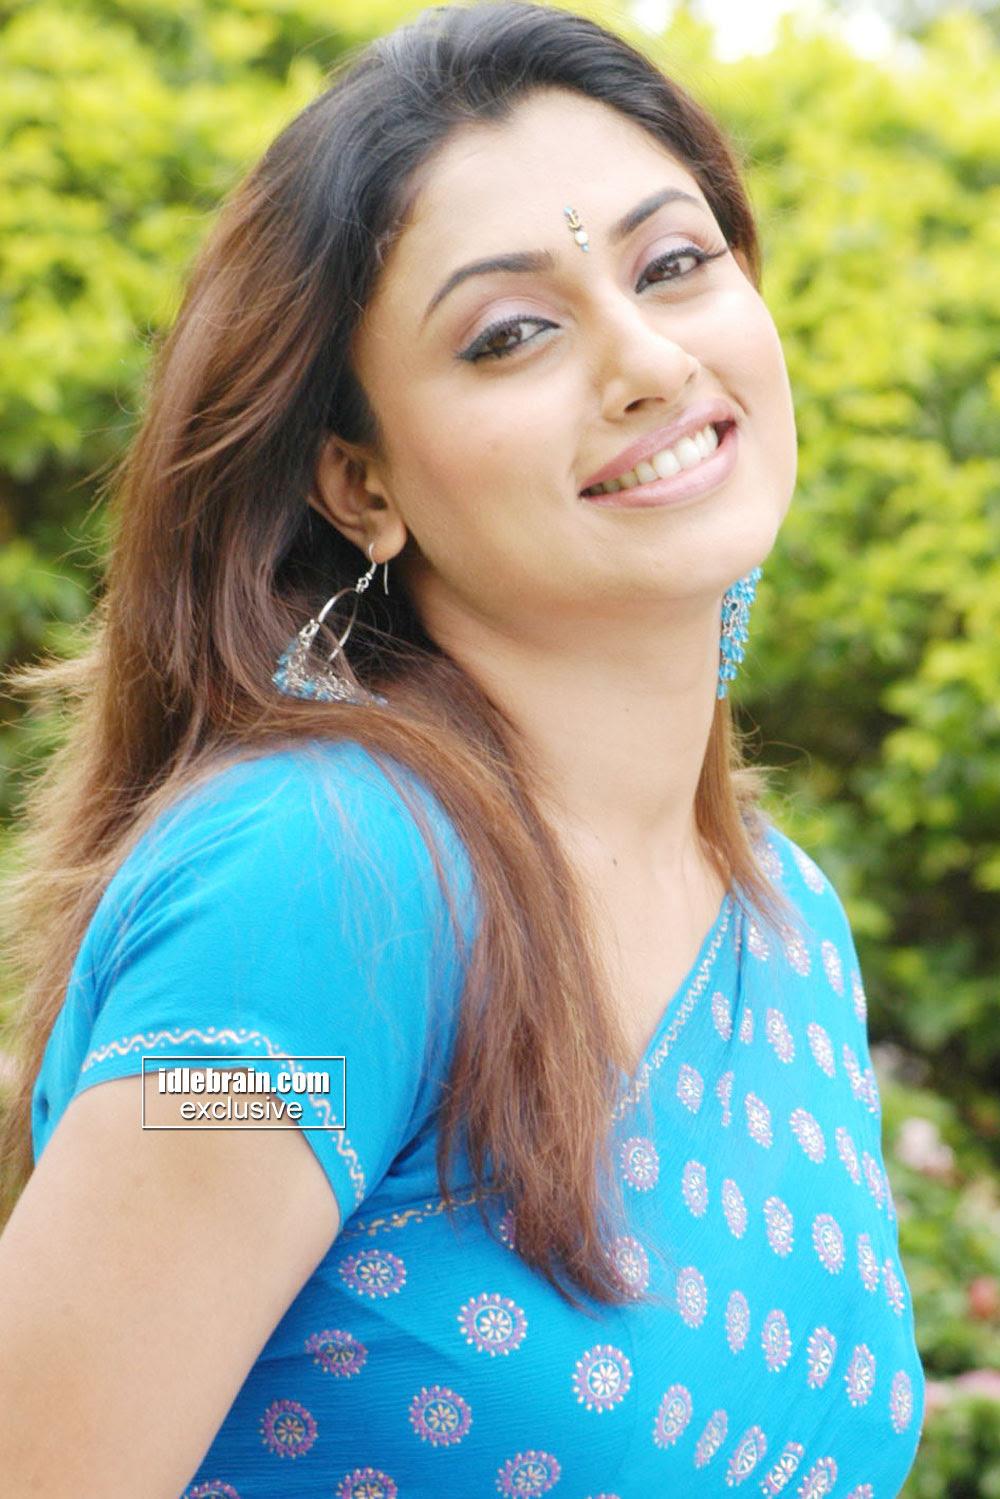 Malavika Indian Tamil Film Actress Very Hot And Sexy Pics